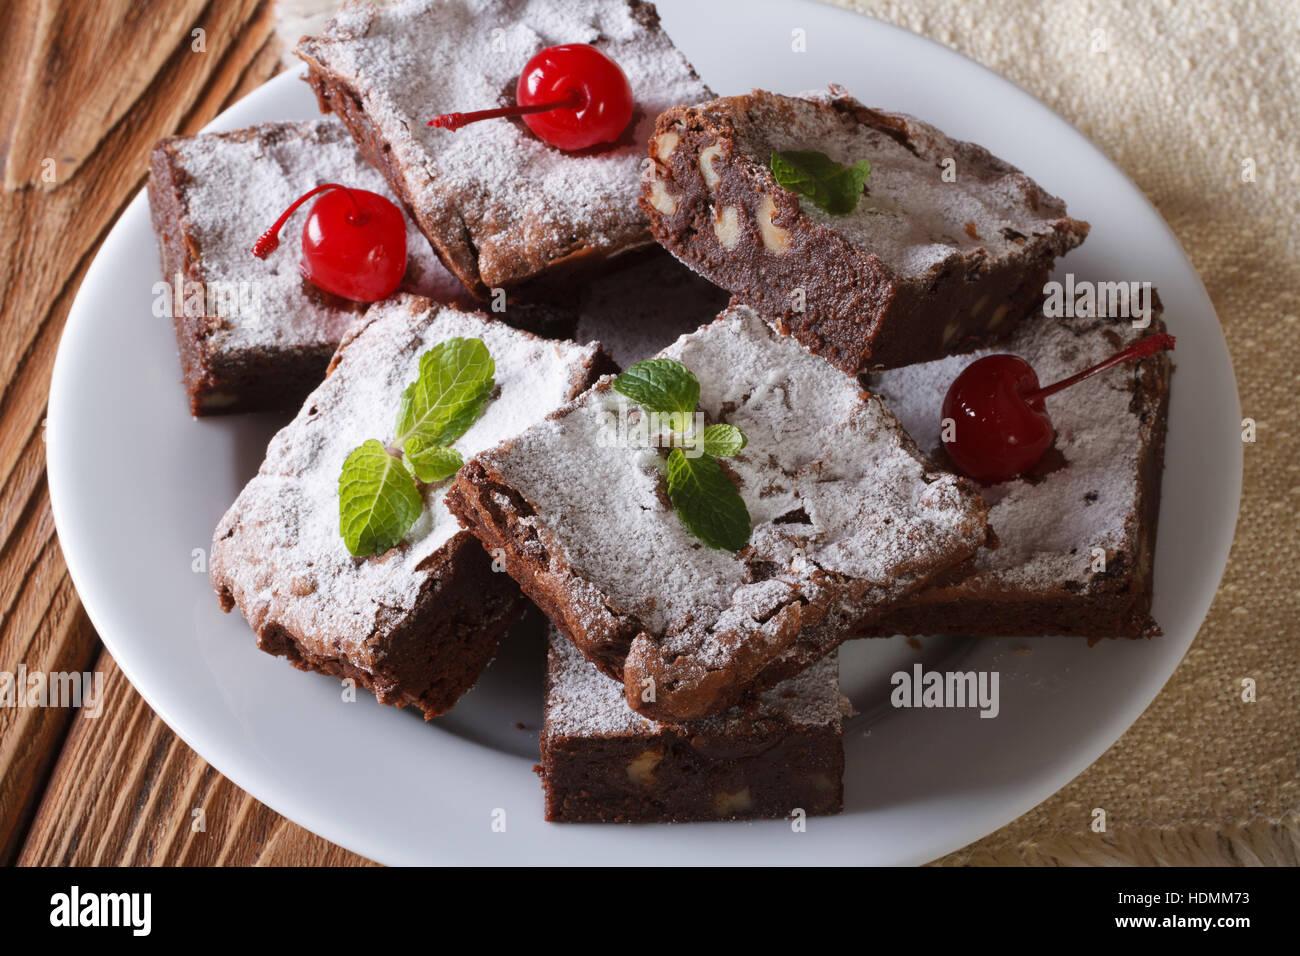 chocolate cake brownie with walnuts and cherries close-up. horizontal - Stock Image